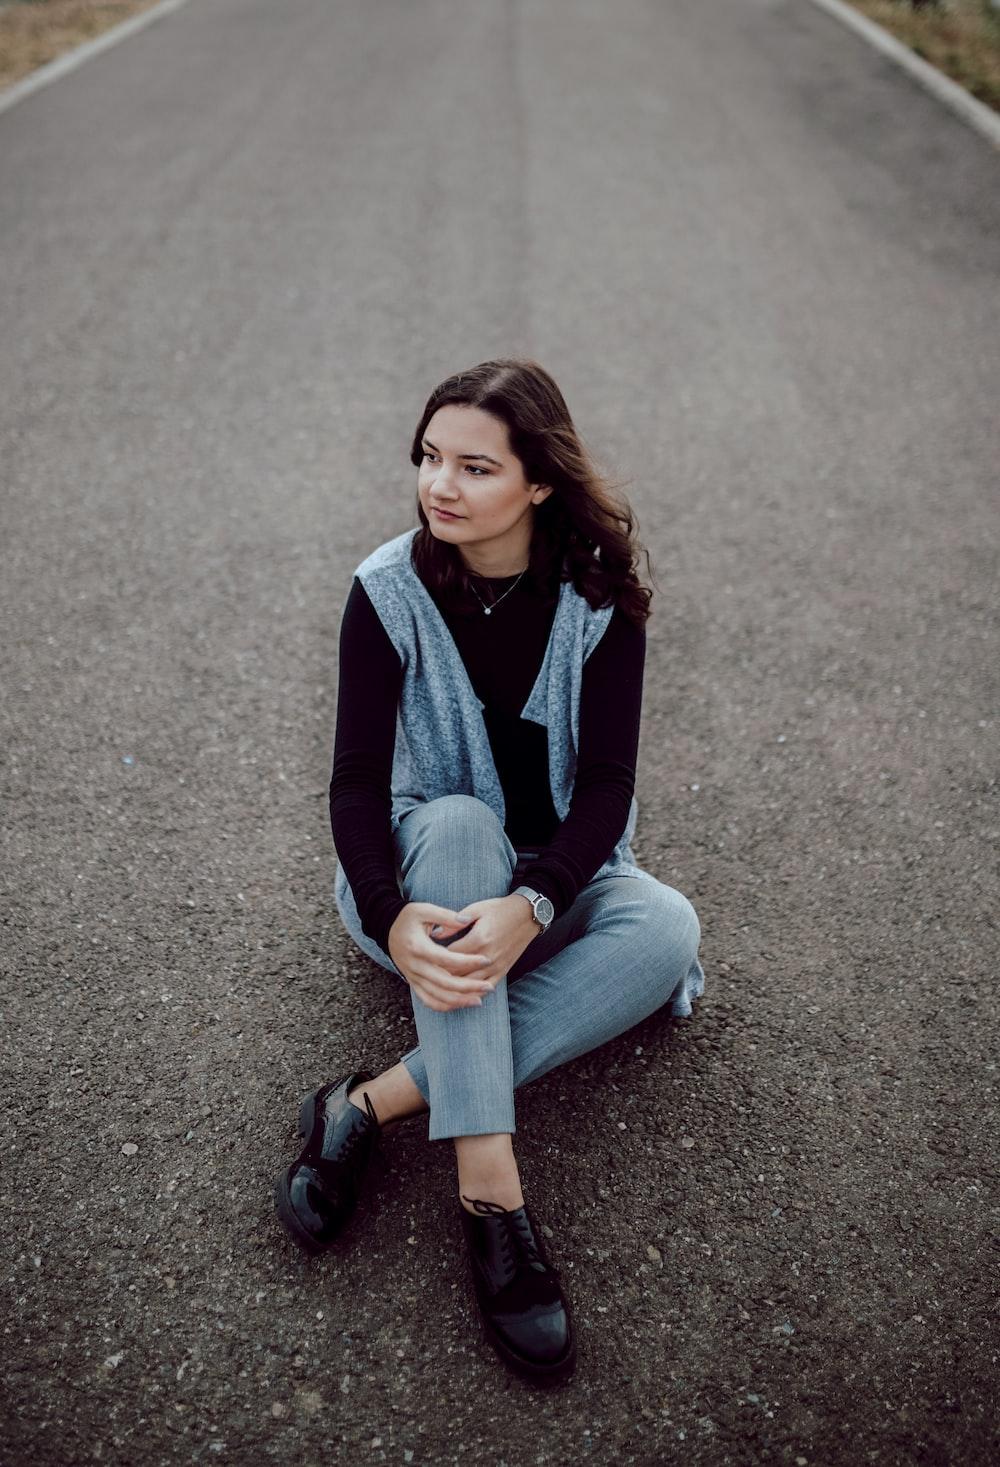 woman sitting on concrete road